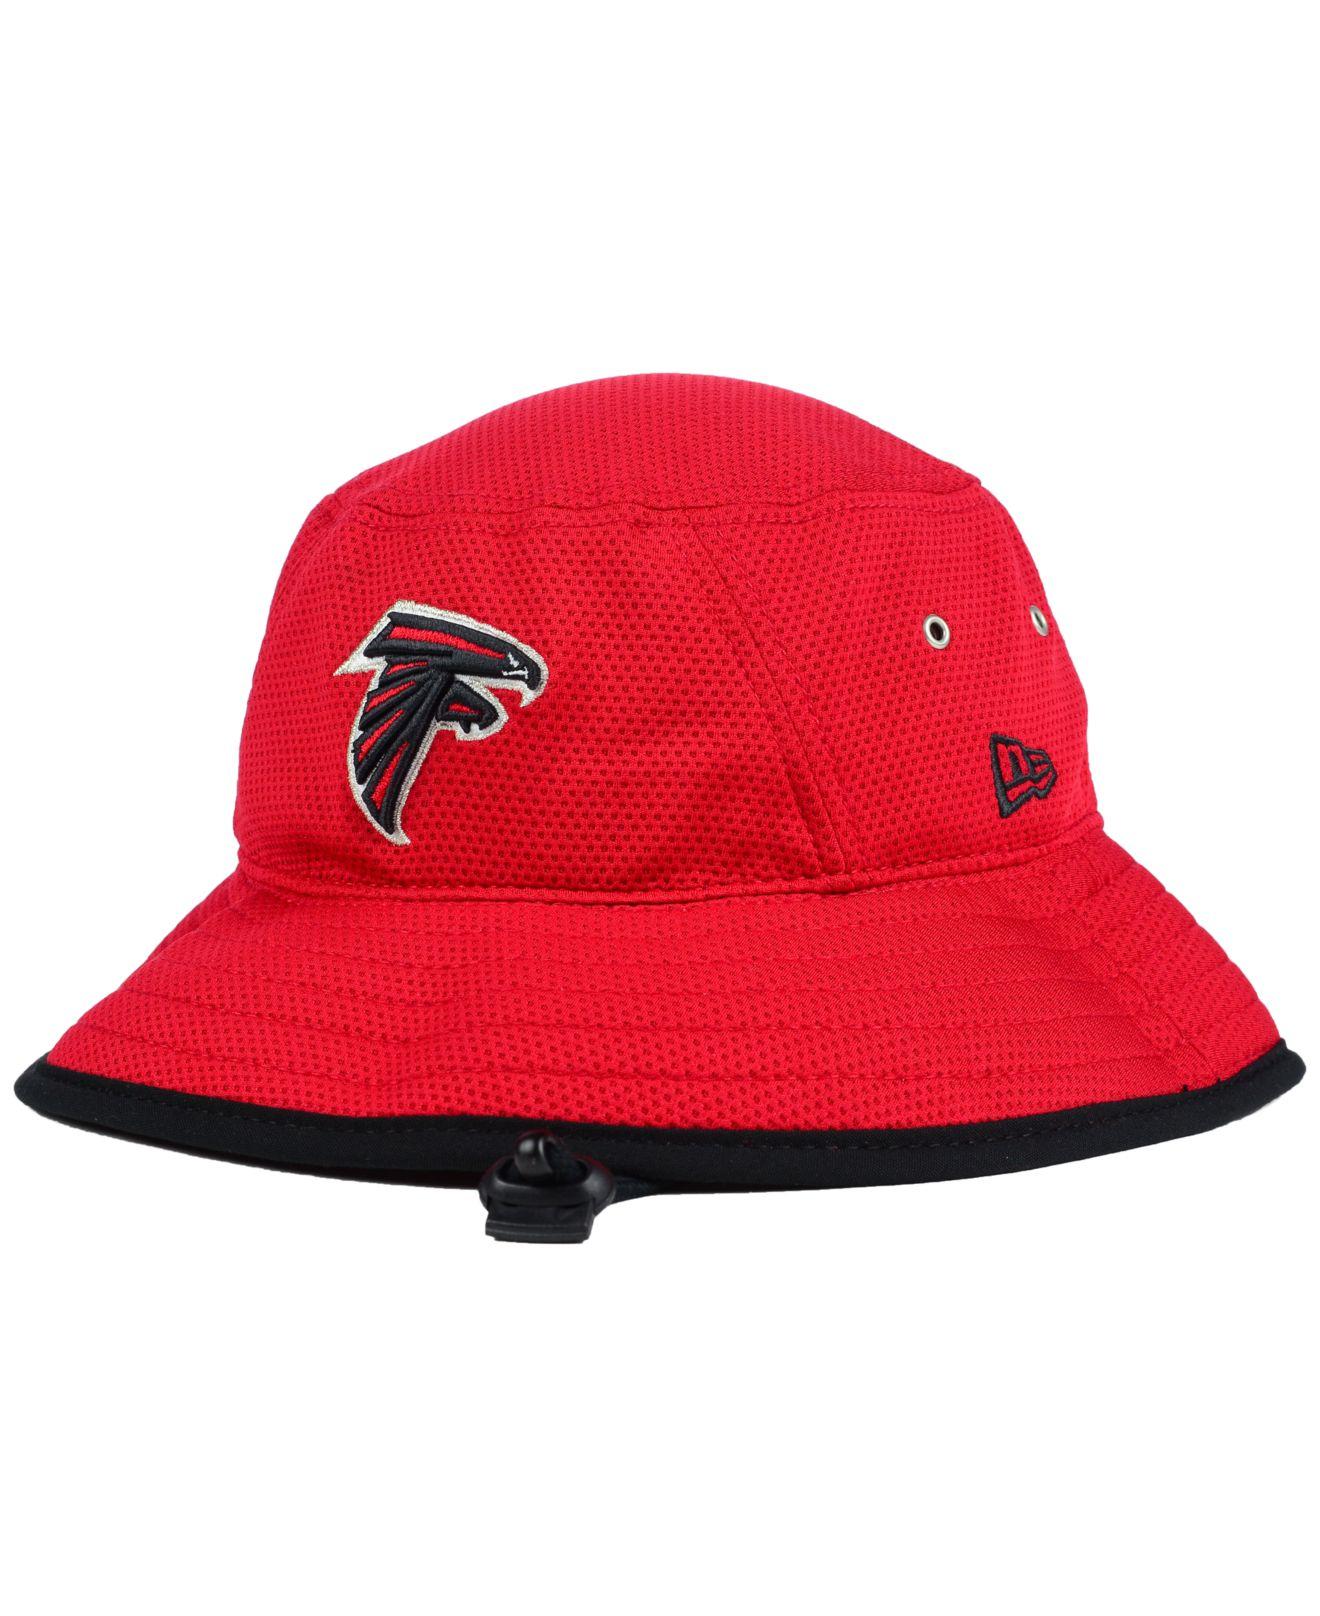 Lyst - KTZ Atlanta Falcons Training Bucket Hat in Red for Men bfcc1130e334